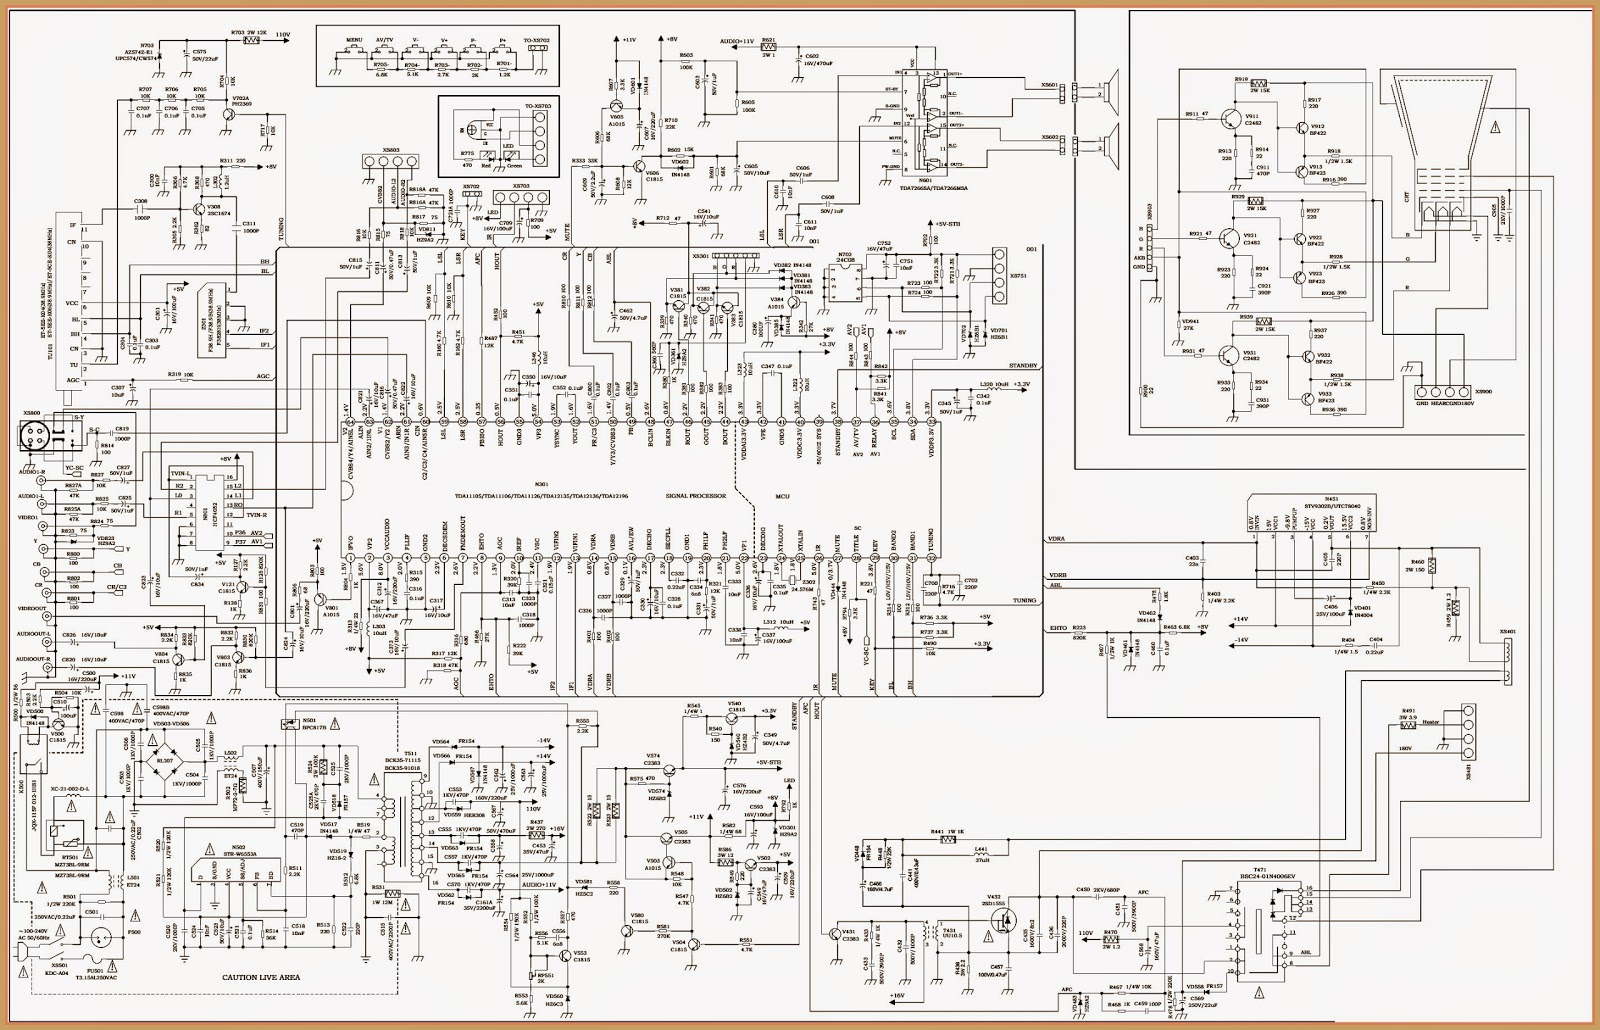 Tv Tuner Card Circuit Diagram Piaget Vs Vygotsky Venn Color Kit Full Tda 11106 Stv9302 Based